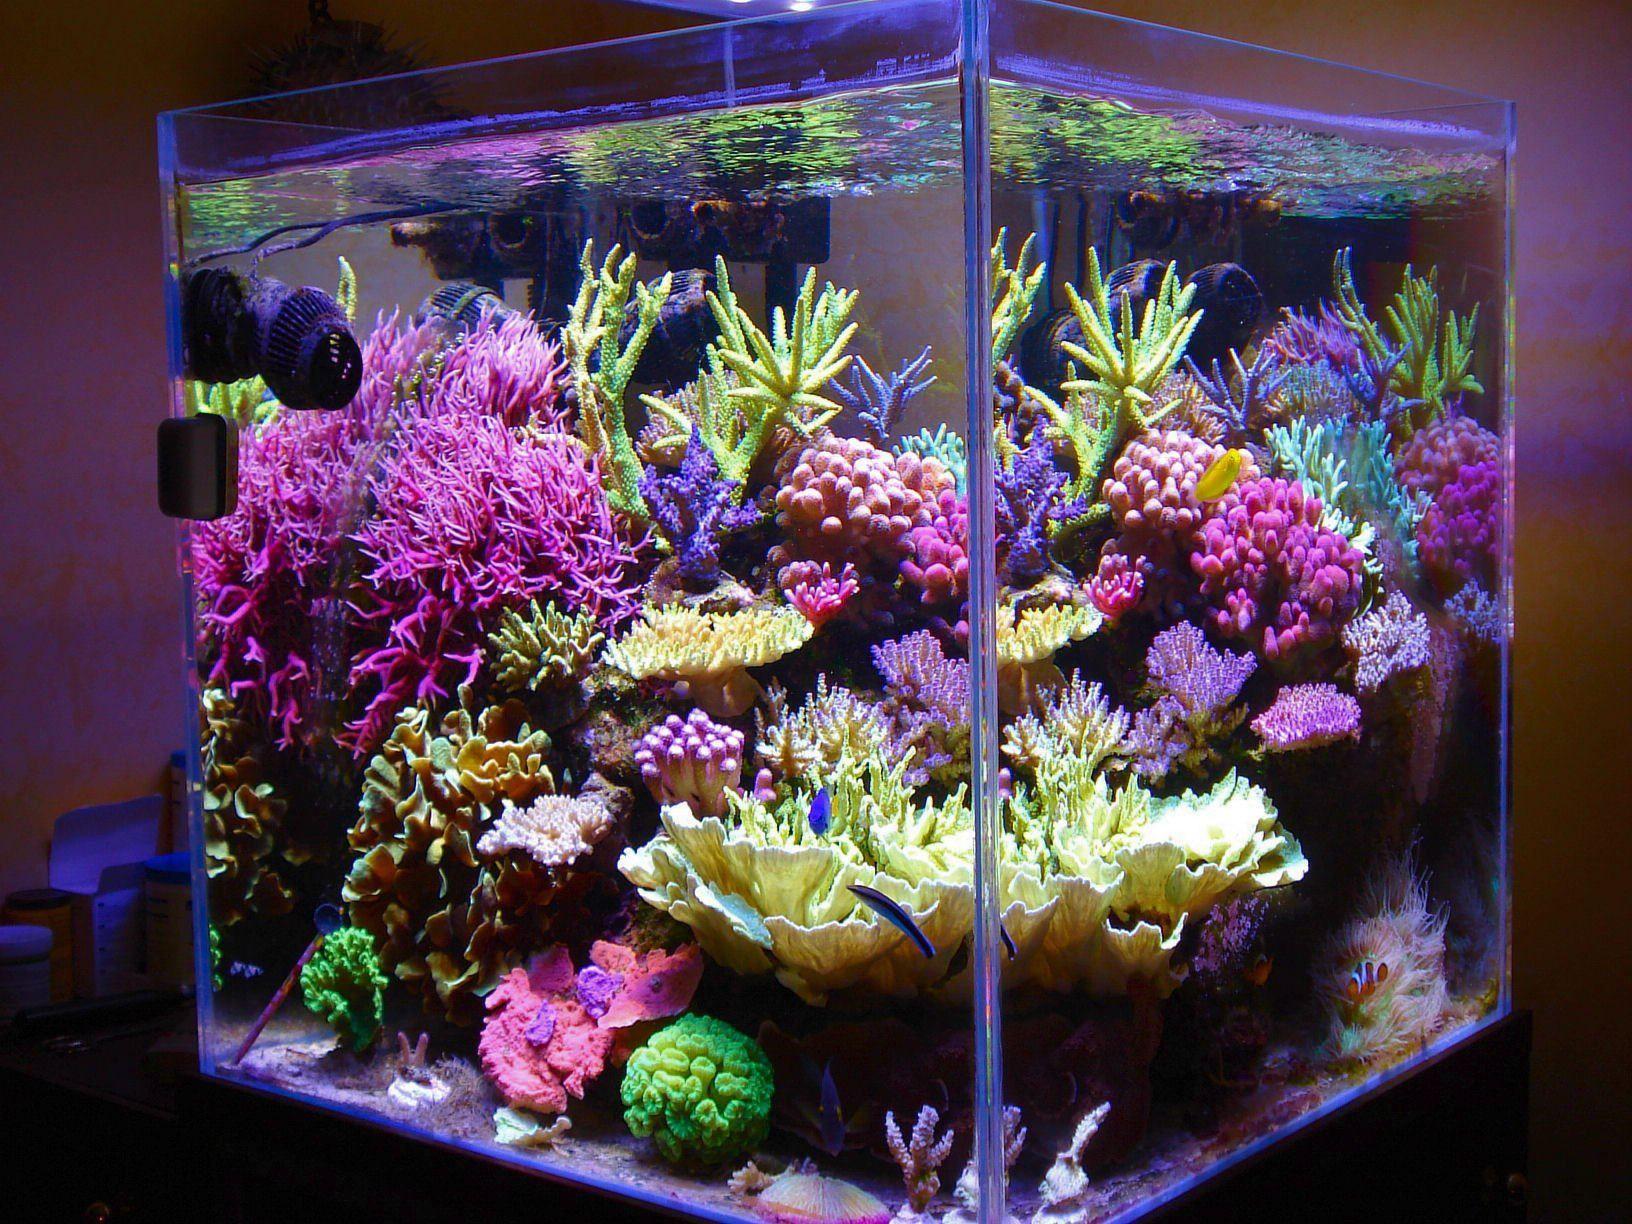 8498d9f46a1300c855f15166cd3e373e Incroyable De Aquarium Deco Des Idées